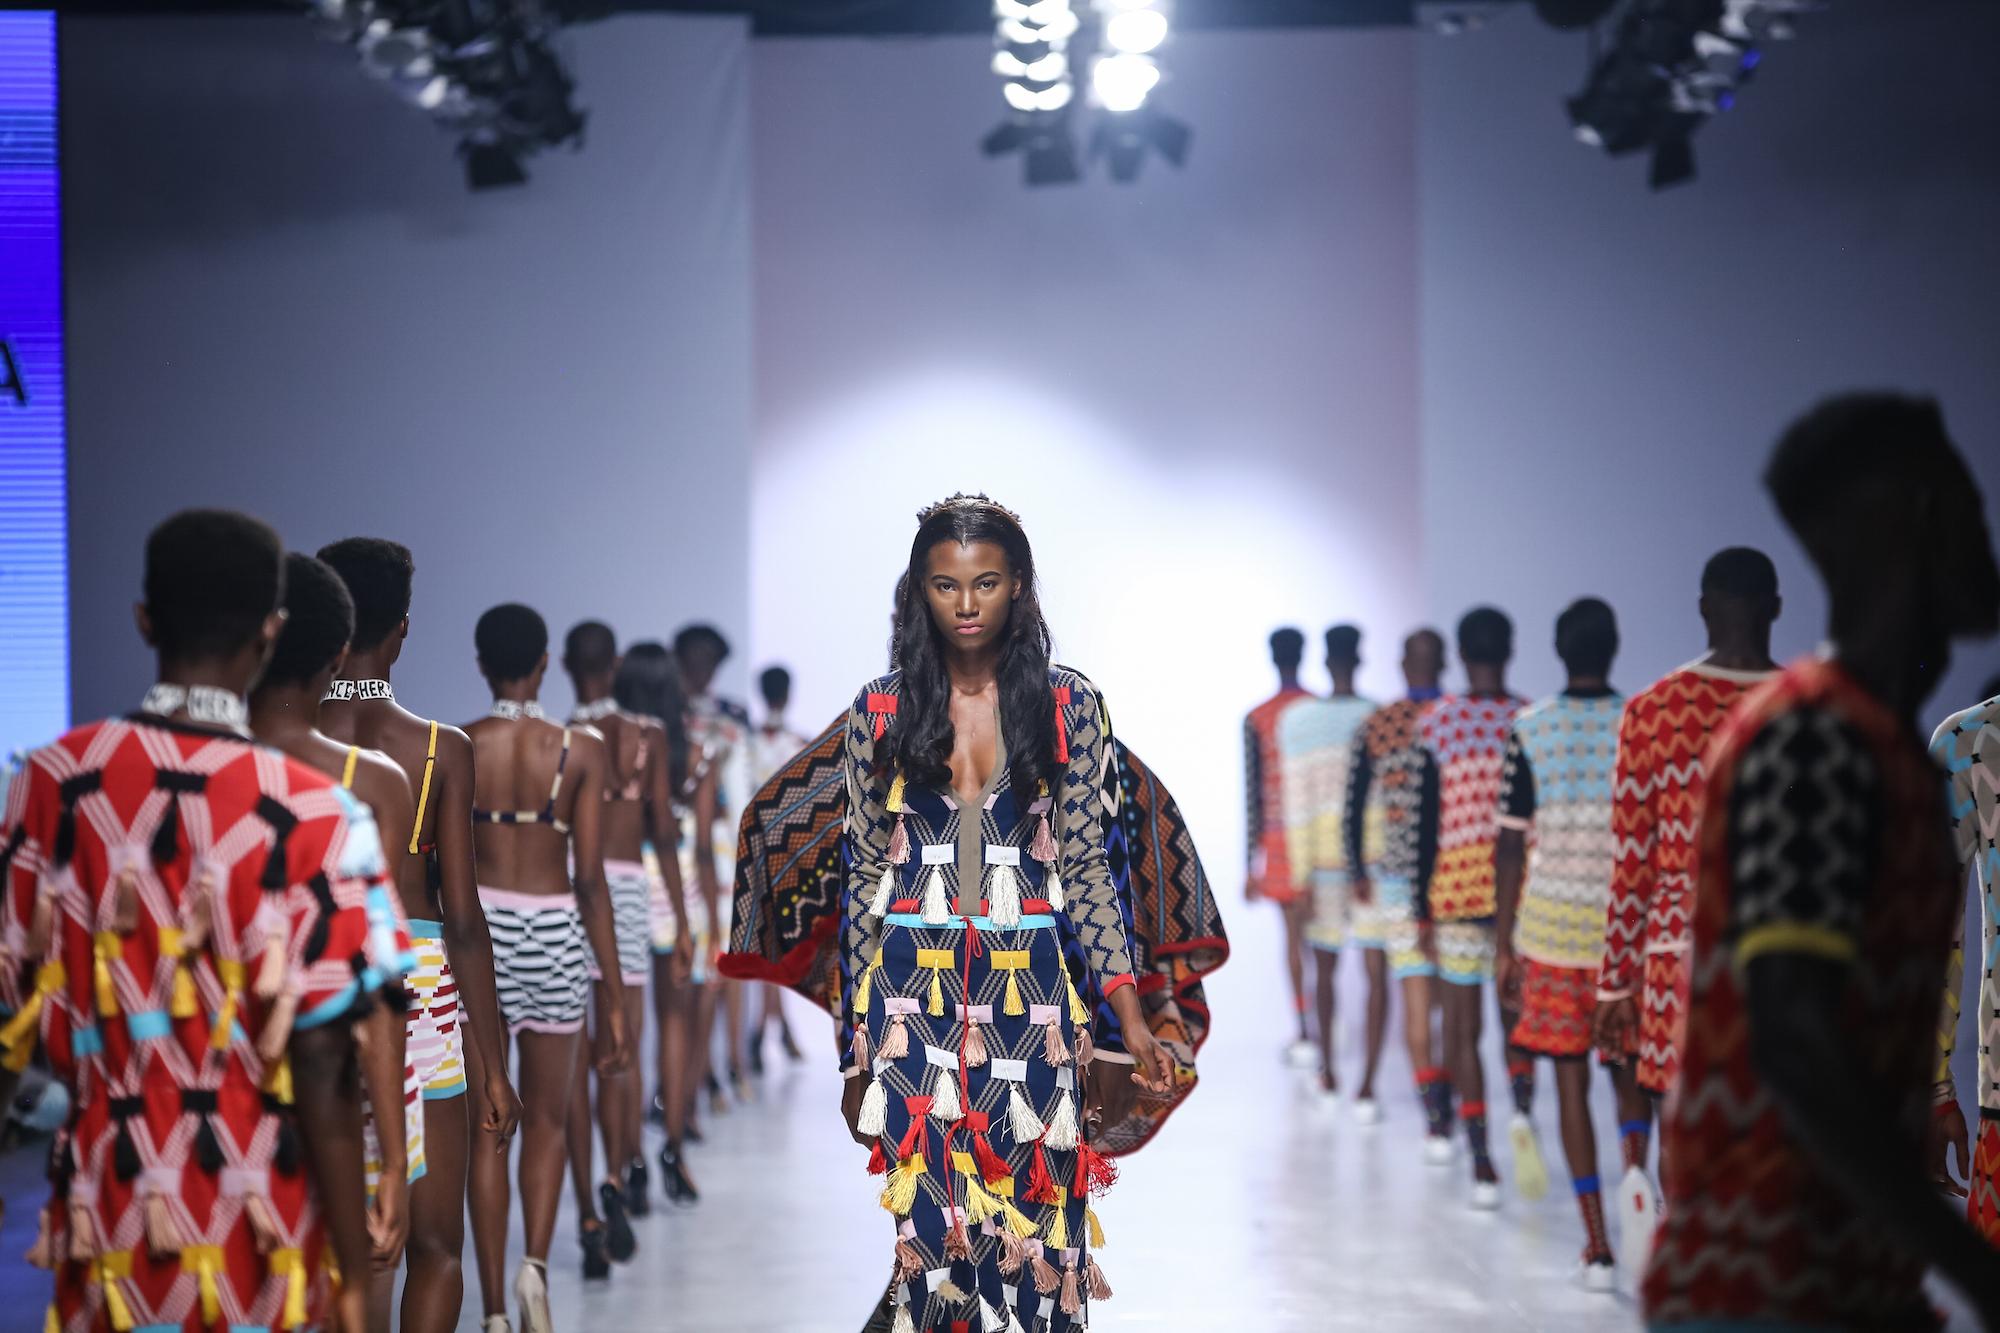 Africa S Fashion Millennials Cash In On World S Internet Addiction Cnn Style